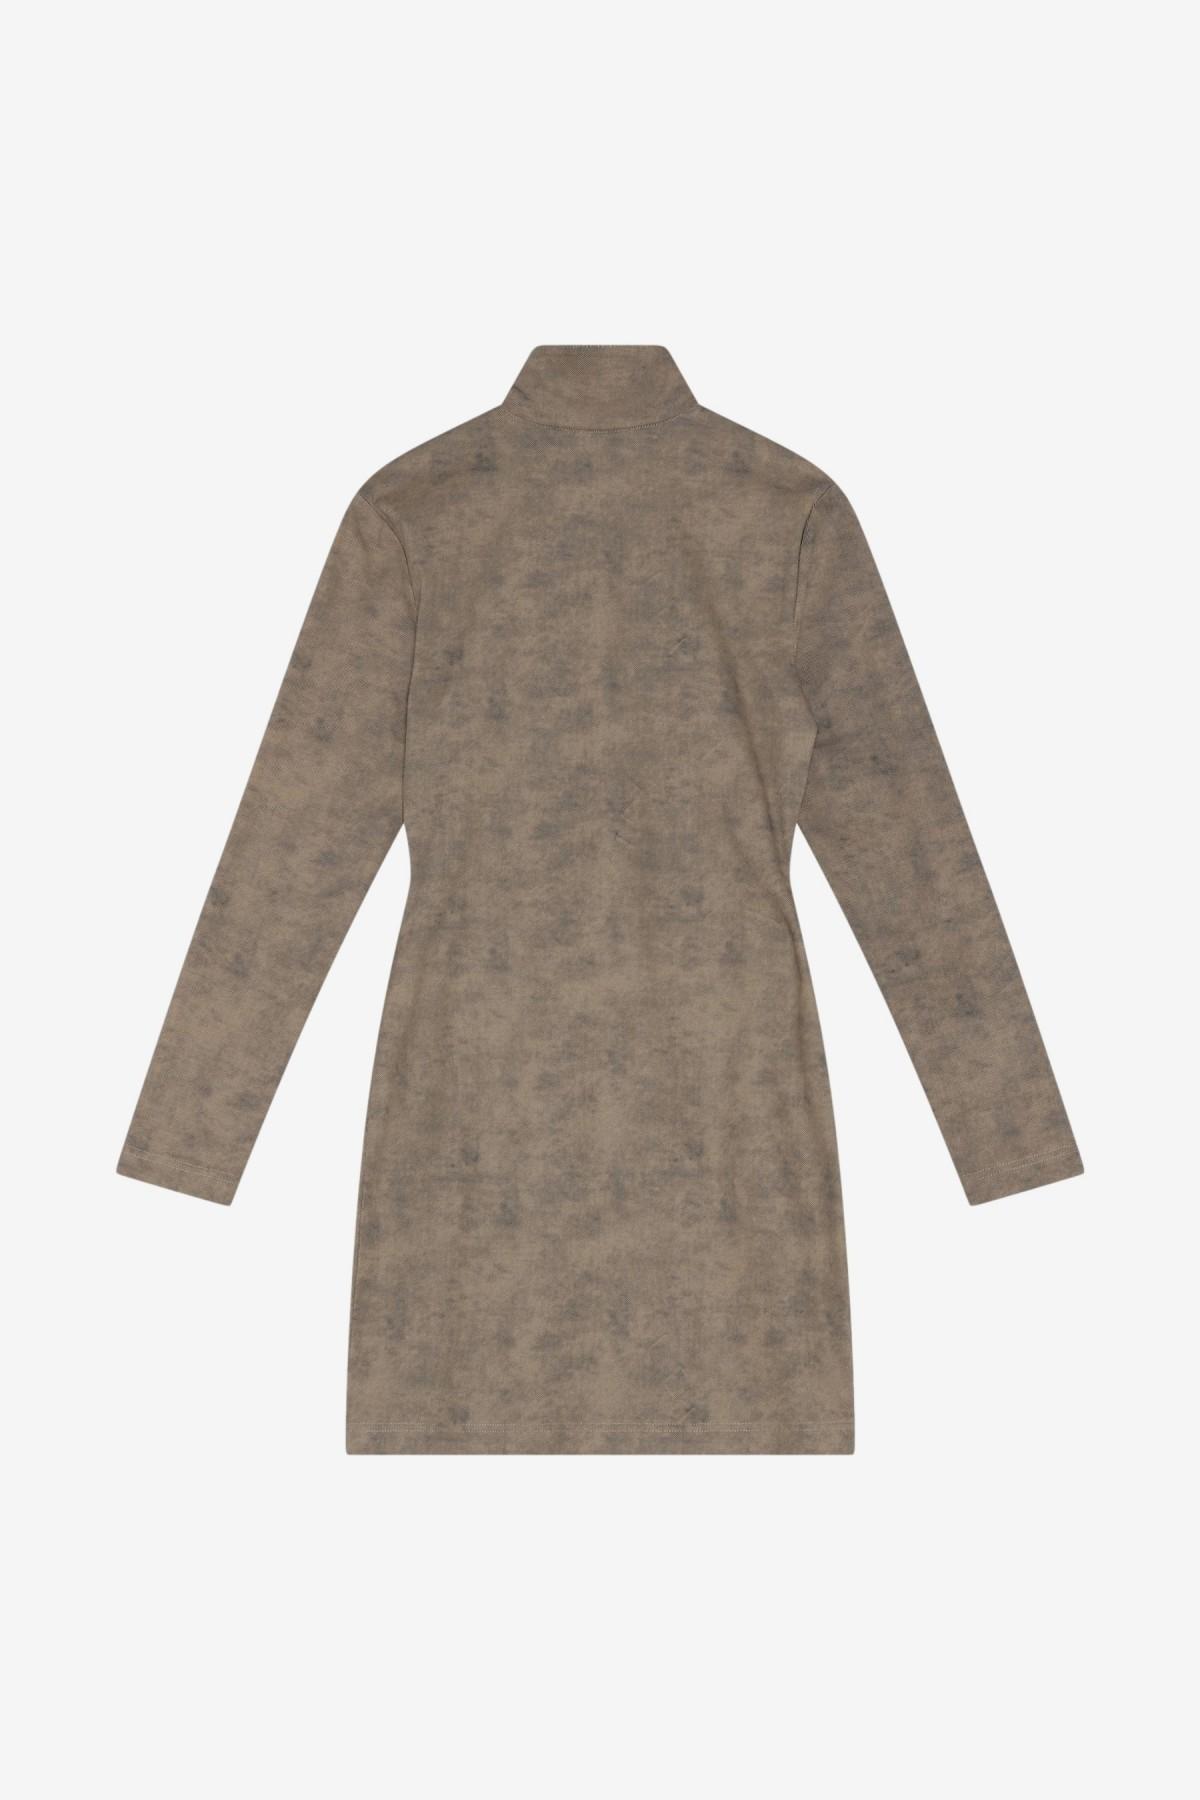 Han Kjøbenhavn Half Zip Dress in Washed Brown